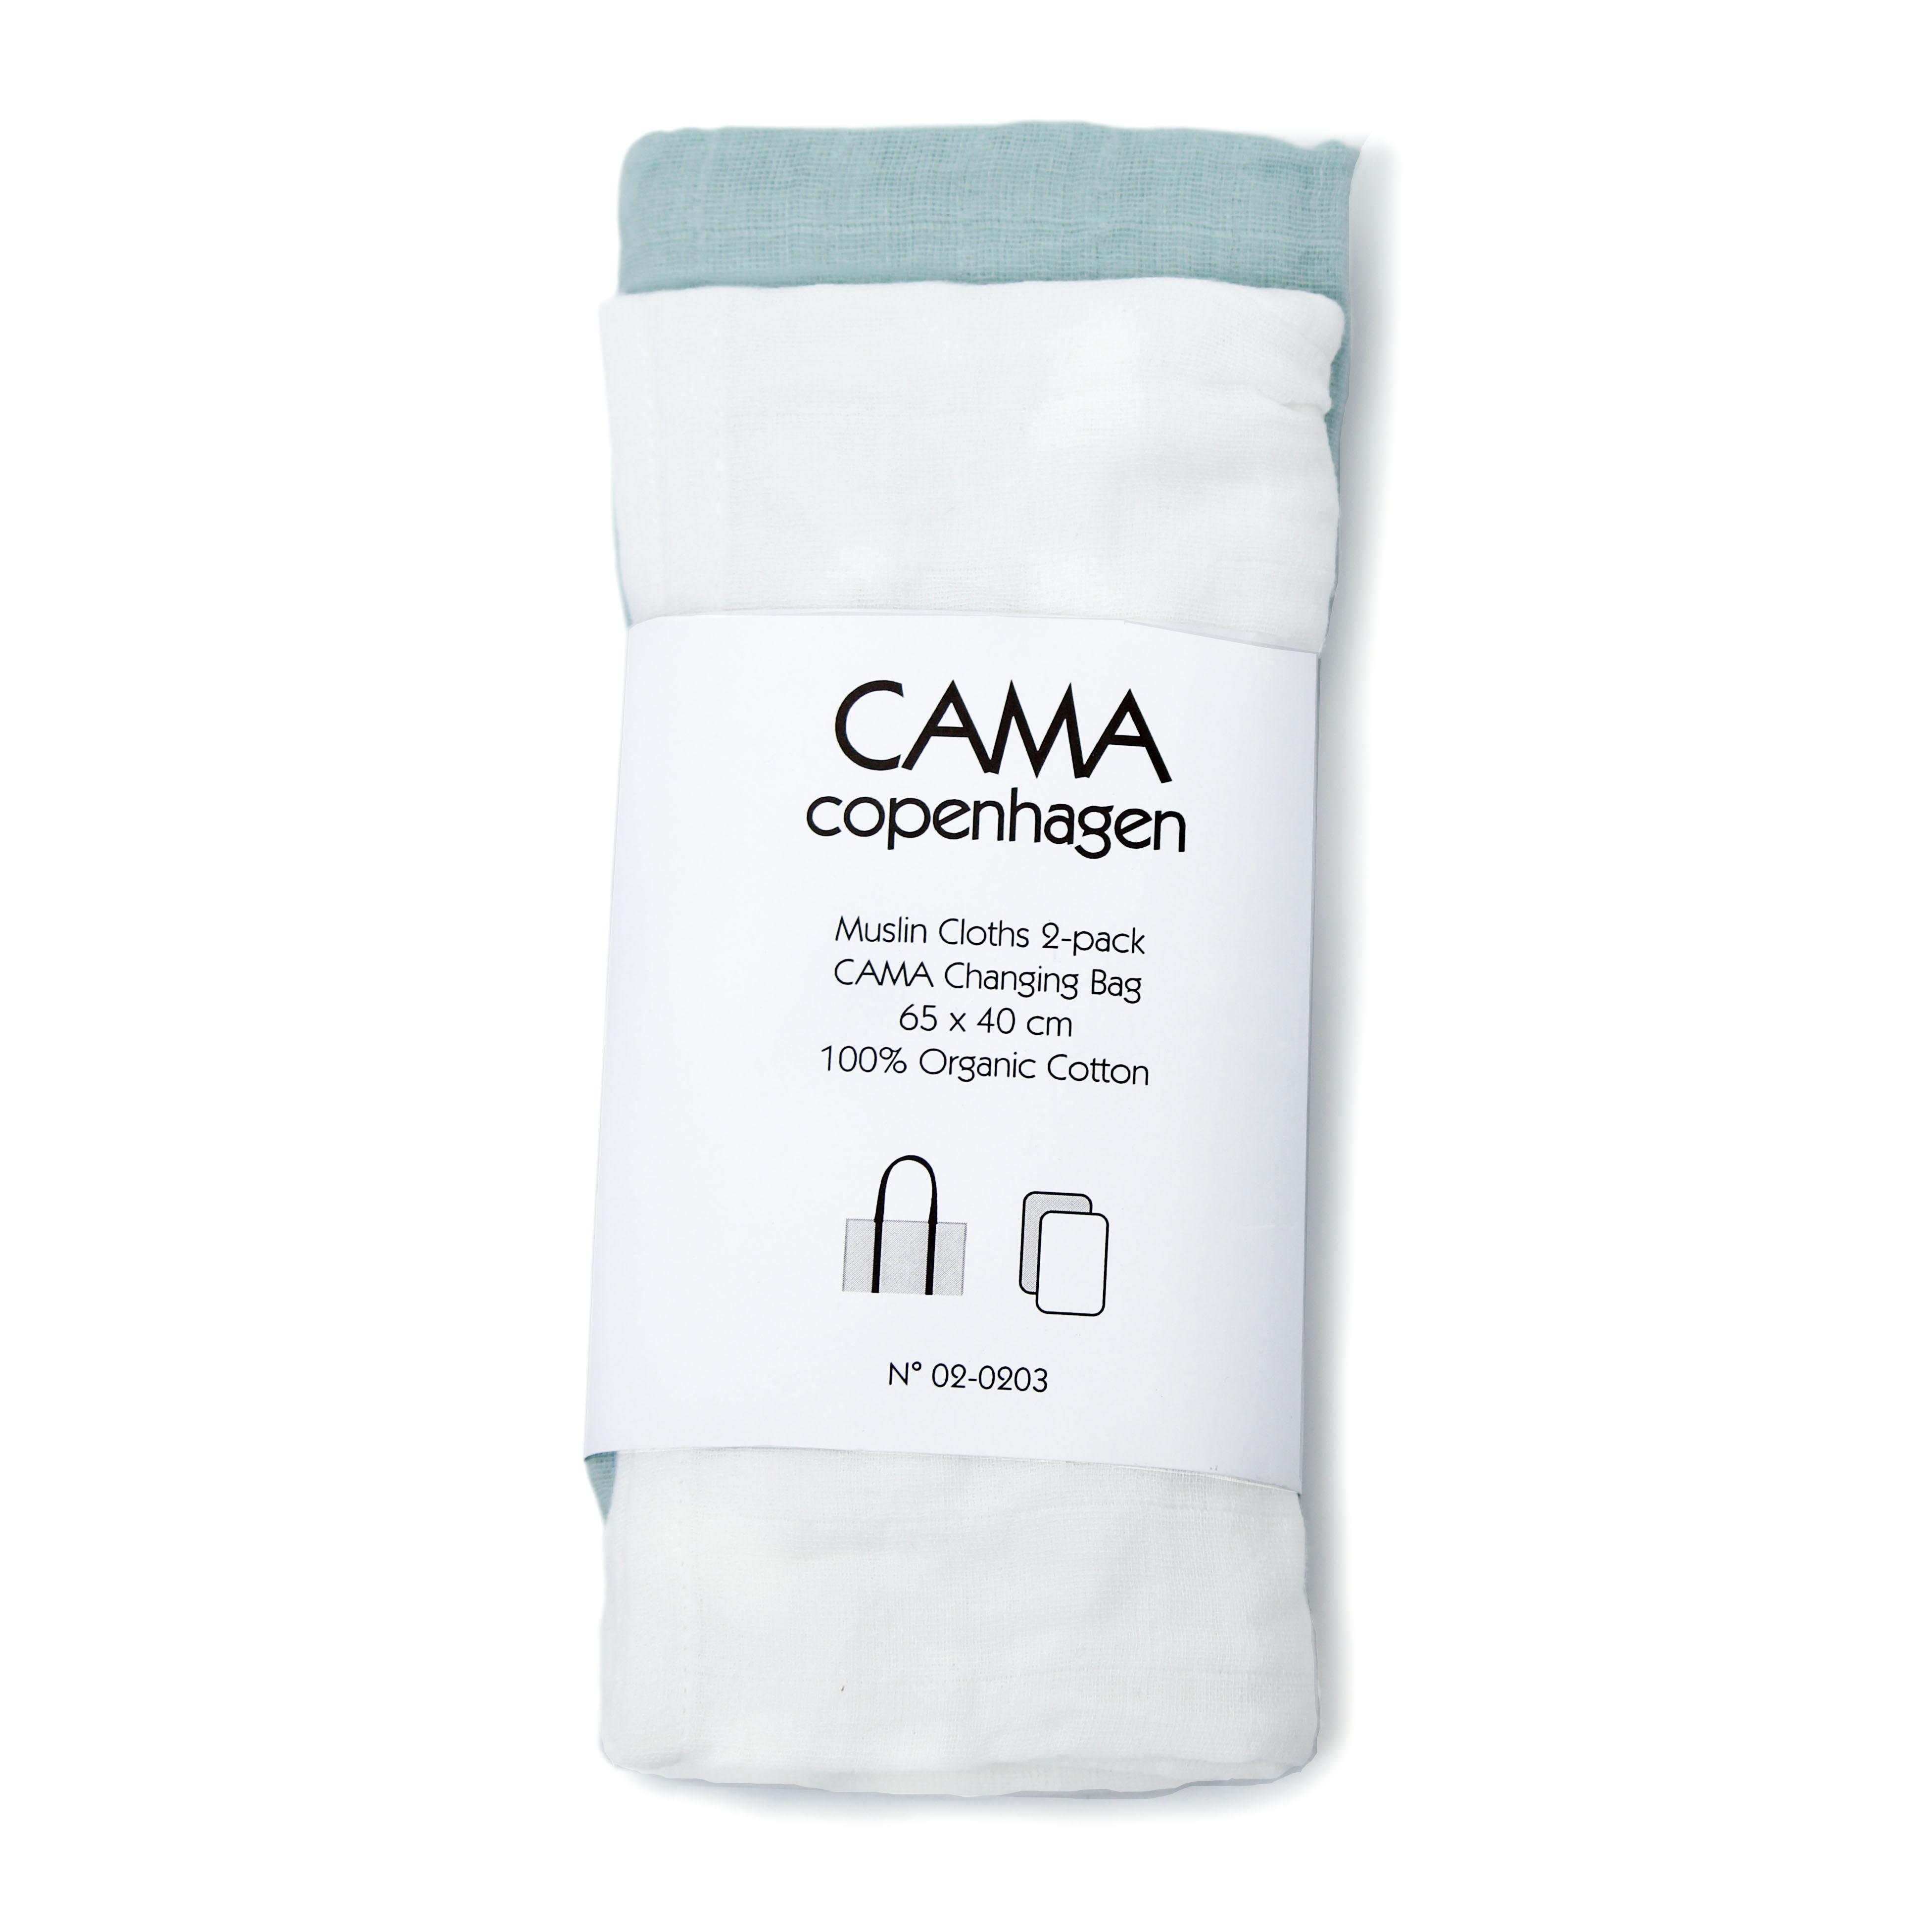 Cama copenhagen Cama copenhagen stofblee 2pak - hvid/cloudy blå, 4 stk. på lager på pixizoo